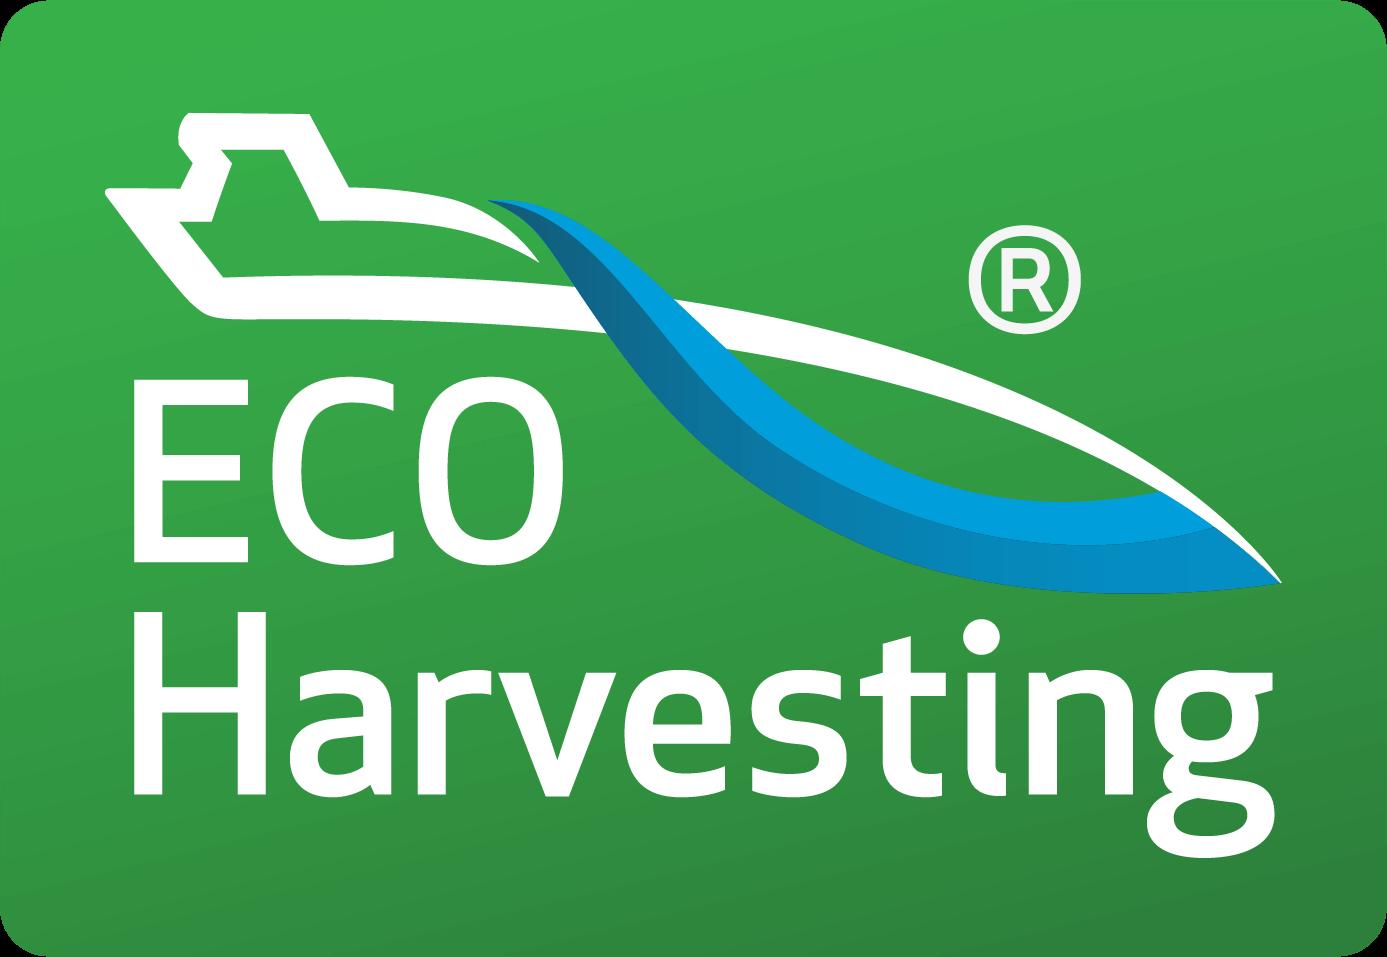 ECO-HARVESTING